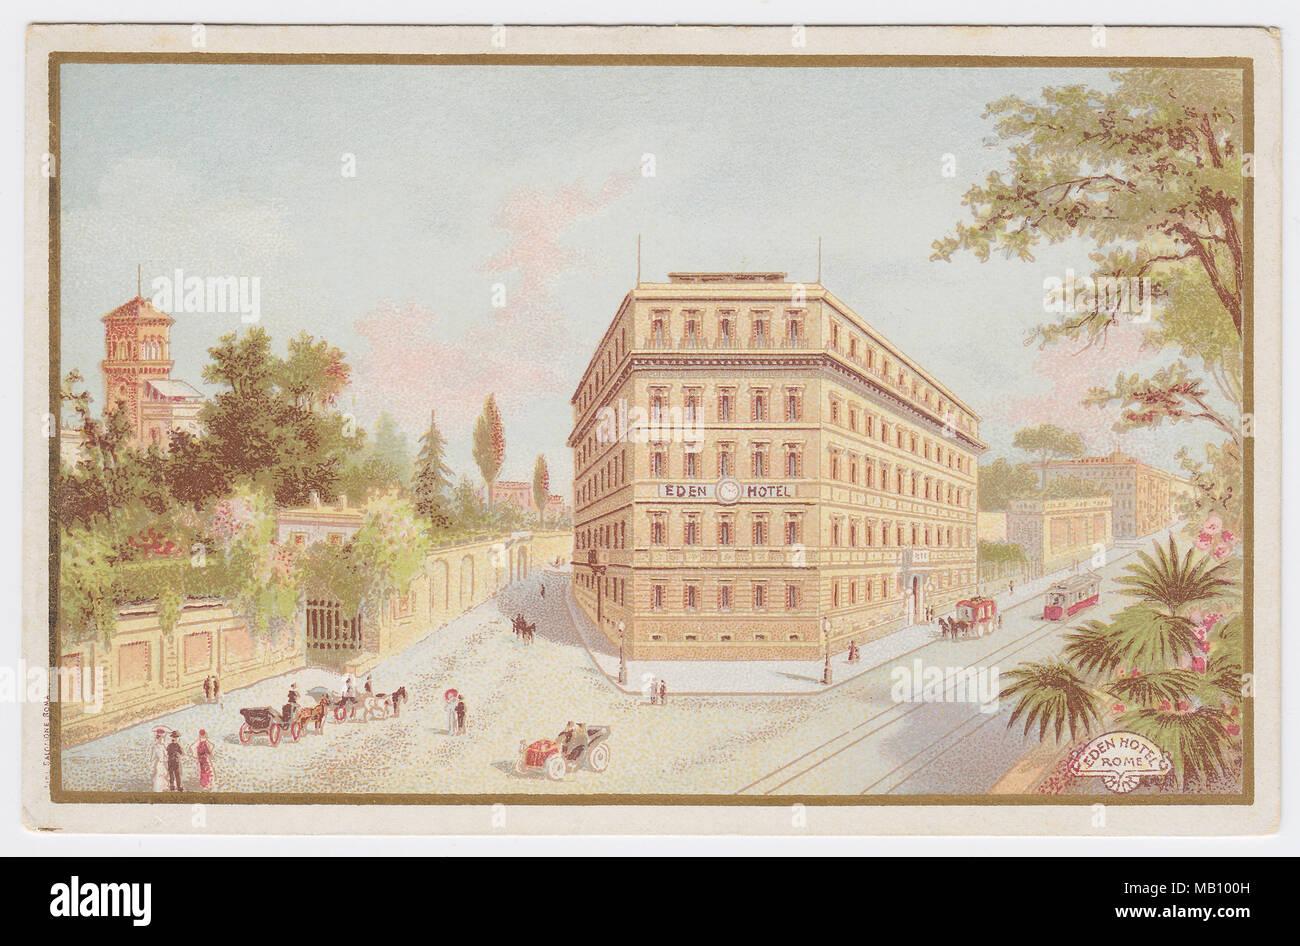 Hotel Eden, Rome, Italy - Stock Image